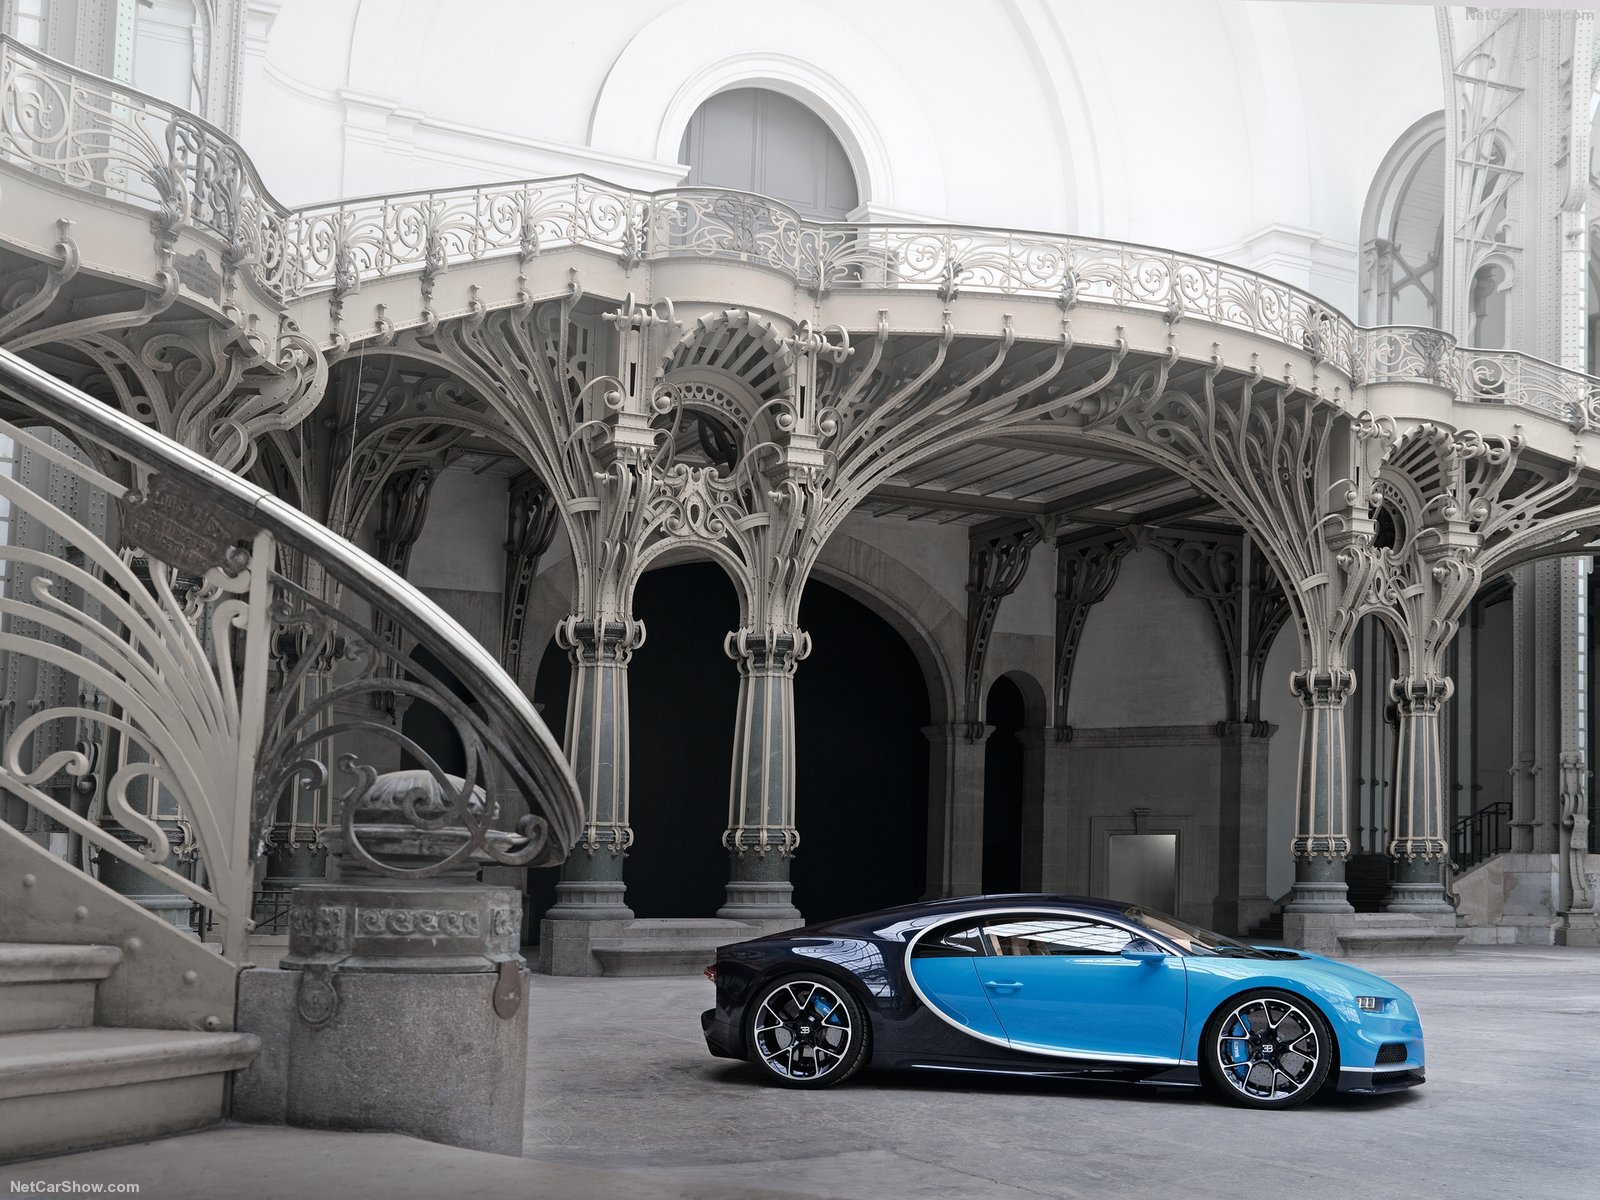 Bugatti-Chiron_2017_1600x1200_wallpaper_11